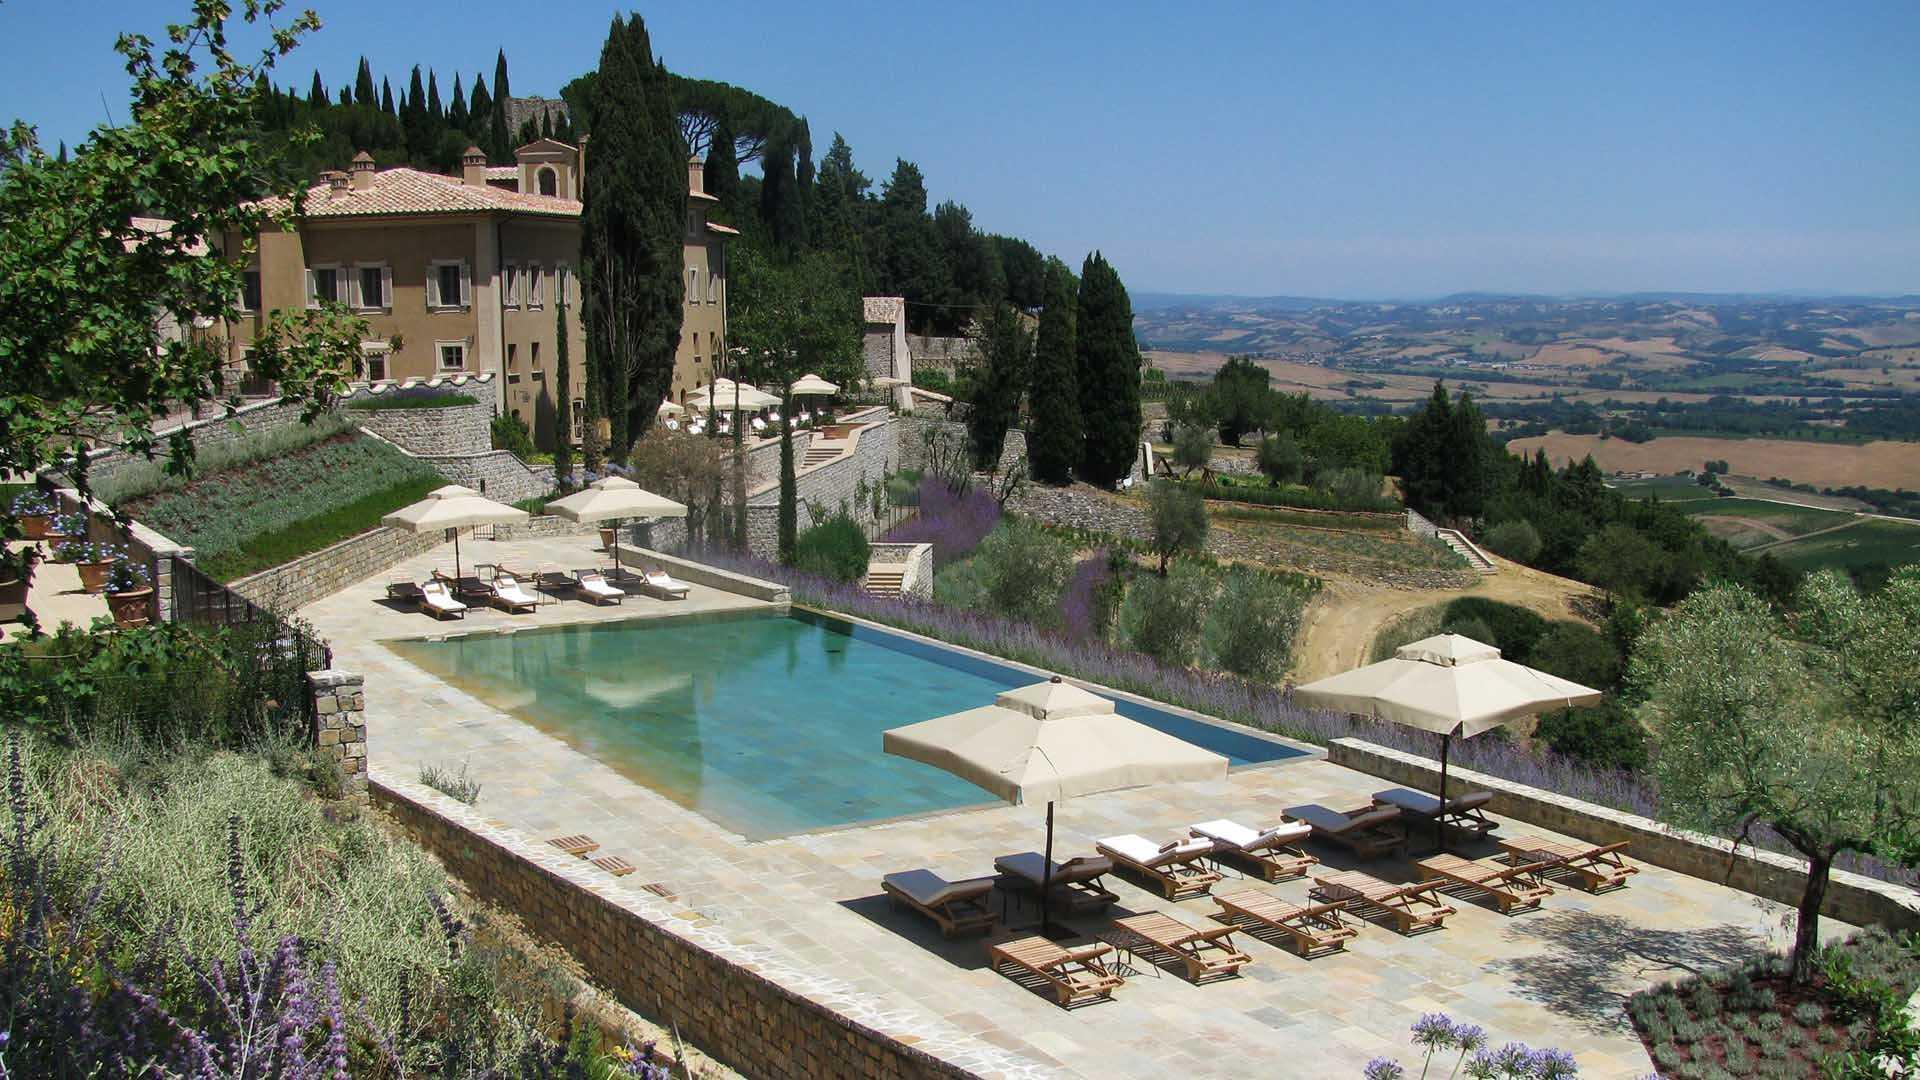 Rosewood Castiglion del Bosco, Tuscany (12 Days of Rosewood)